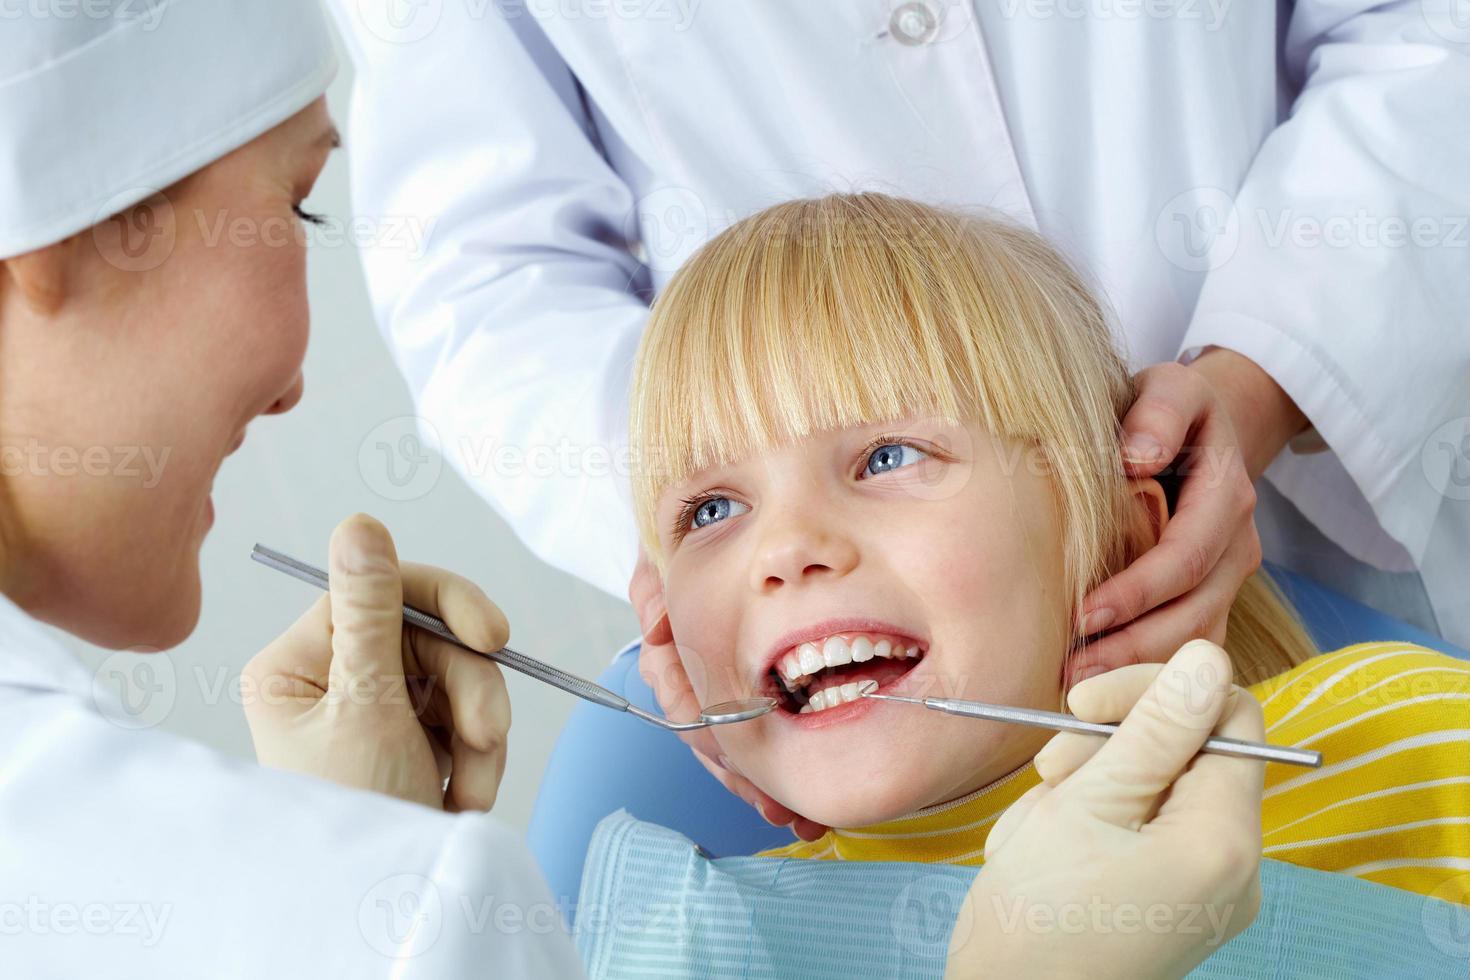 bilan dentaire photo